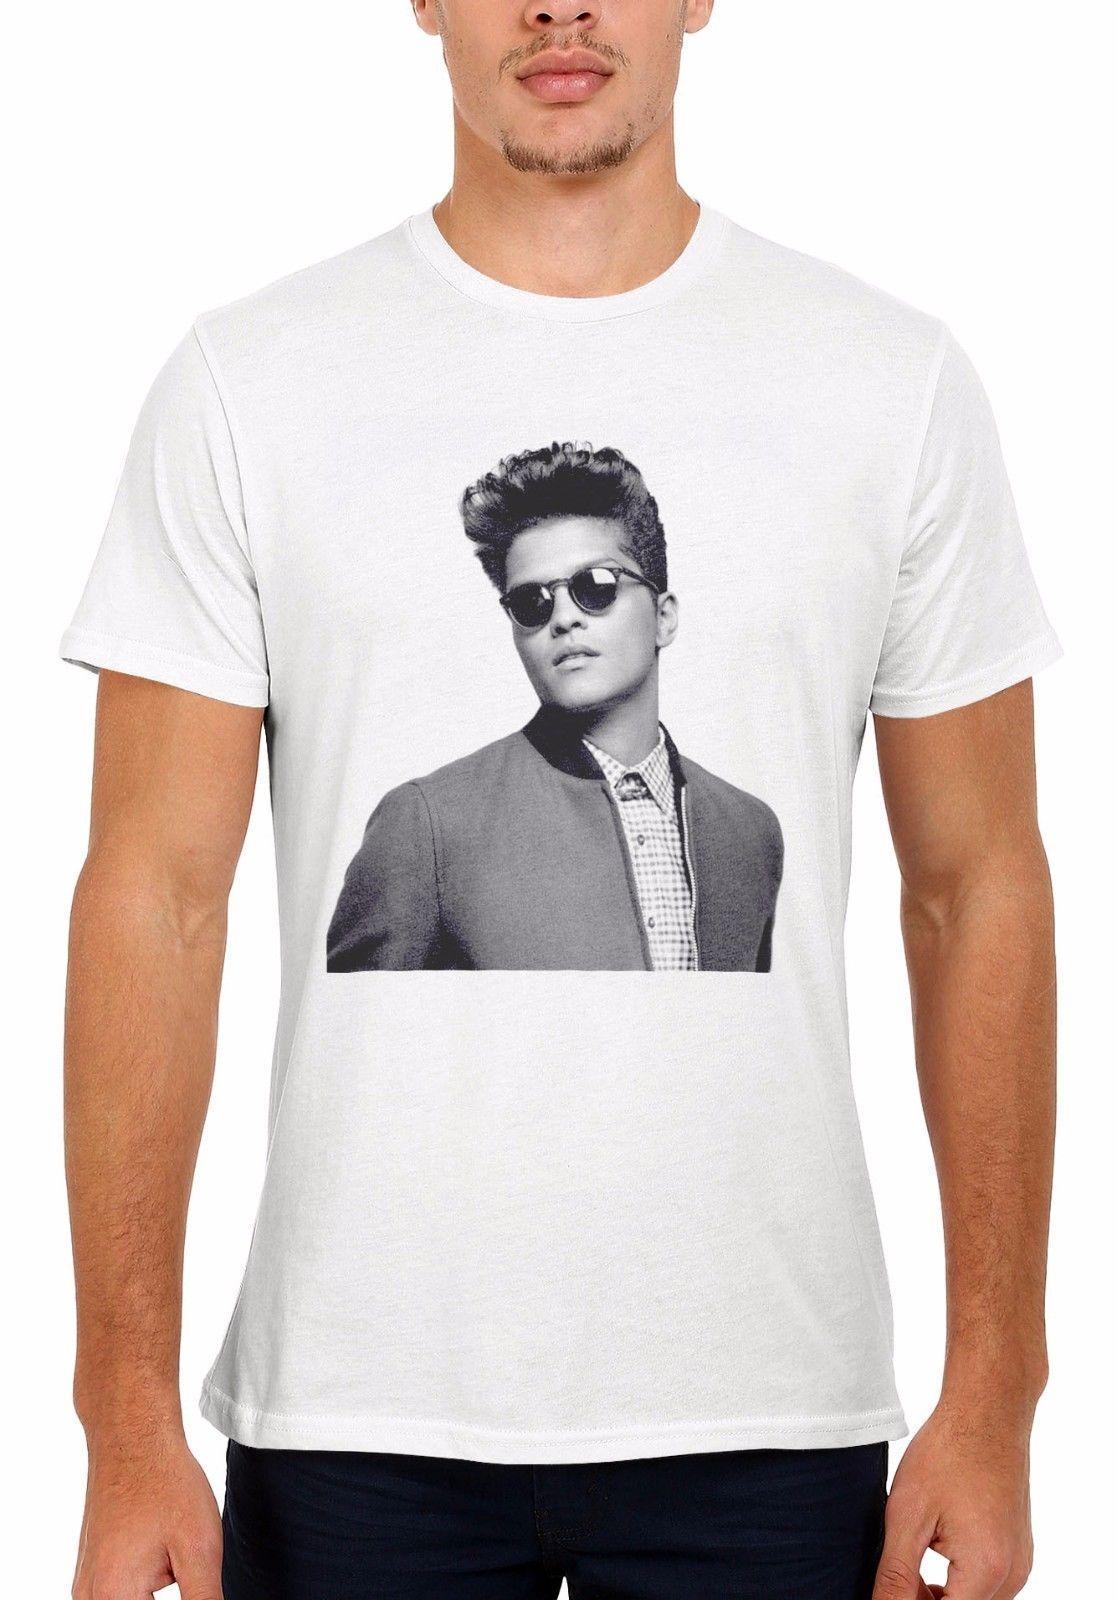 Compre Bruno Mars Singer RB Funk Pop Soul Hombres Mujeres Chaleco Camiseta  Sin Mangas Camiseta Unisex 1959 Hipster O Cuello Tops Geniales Hip Hop  Manga ... 2962a9ecc22